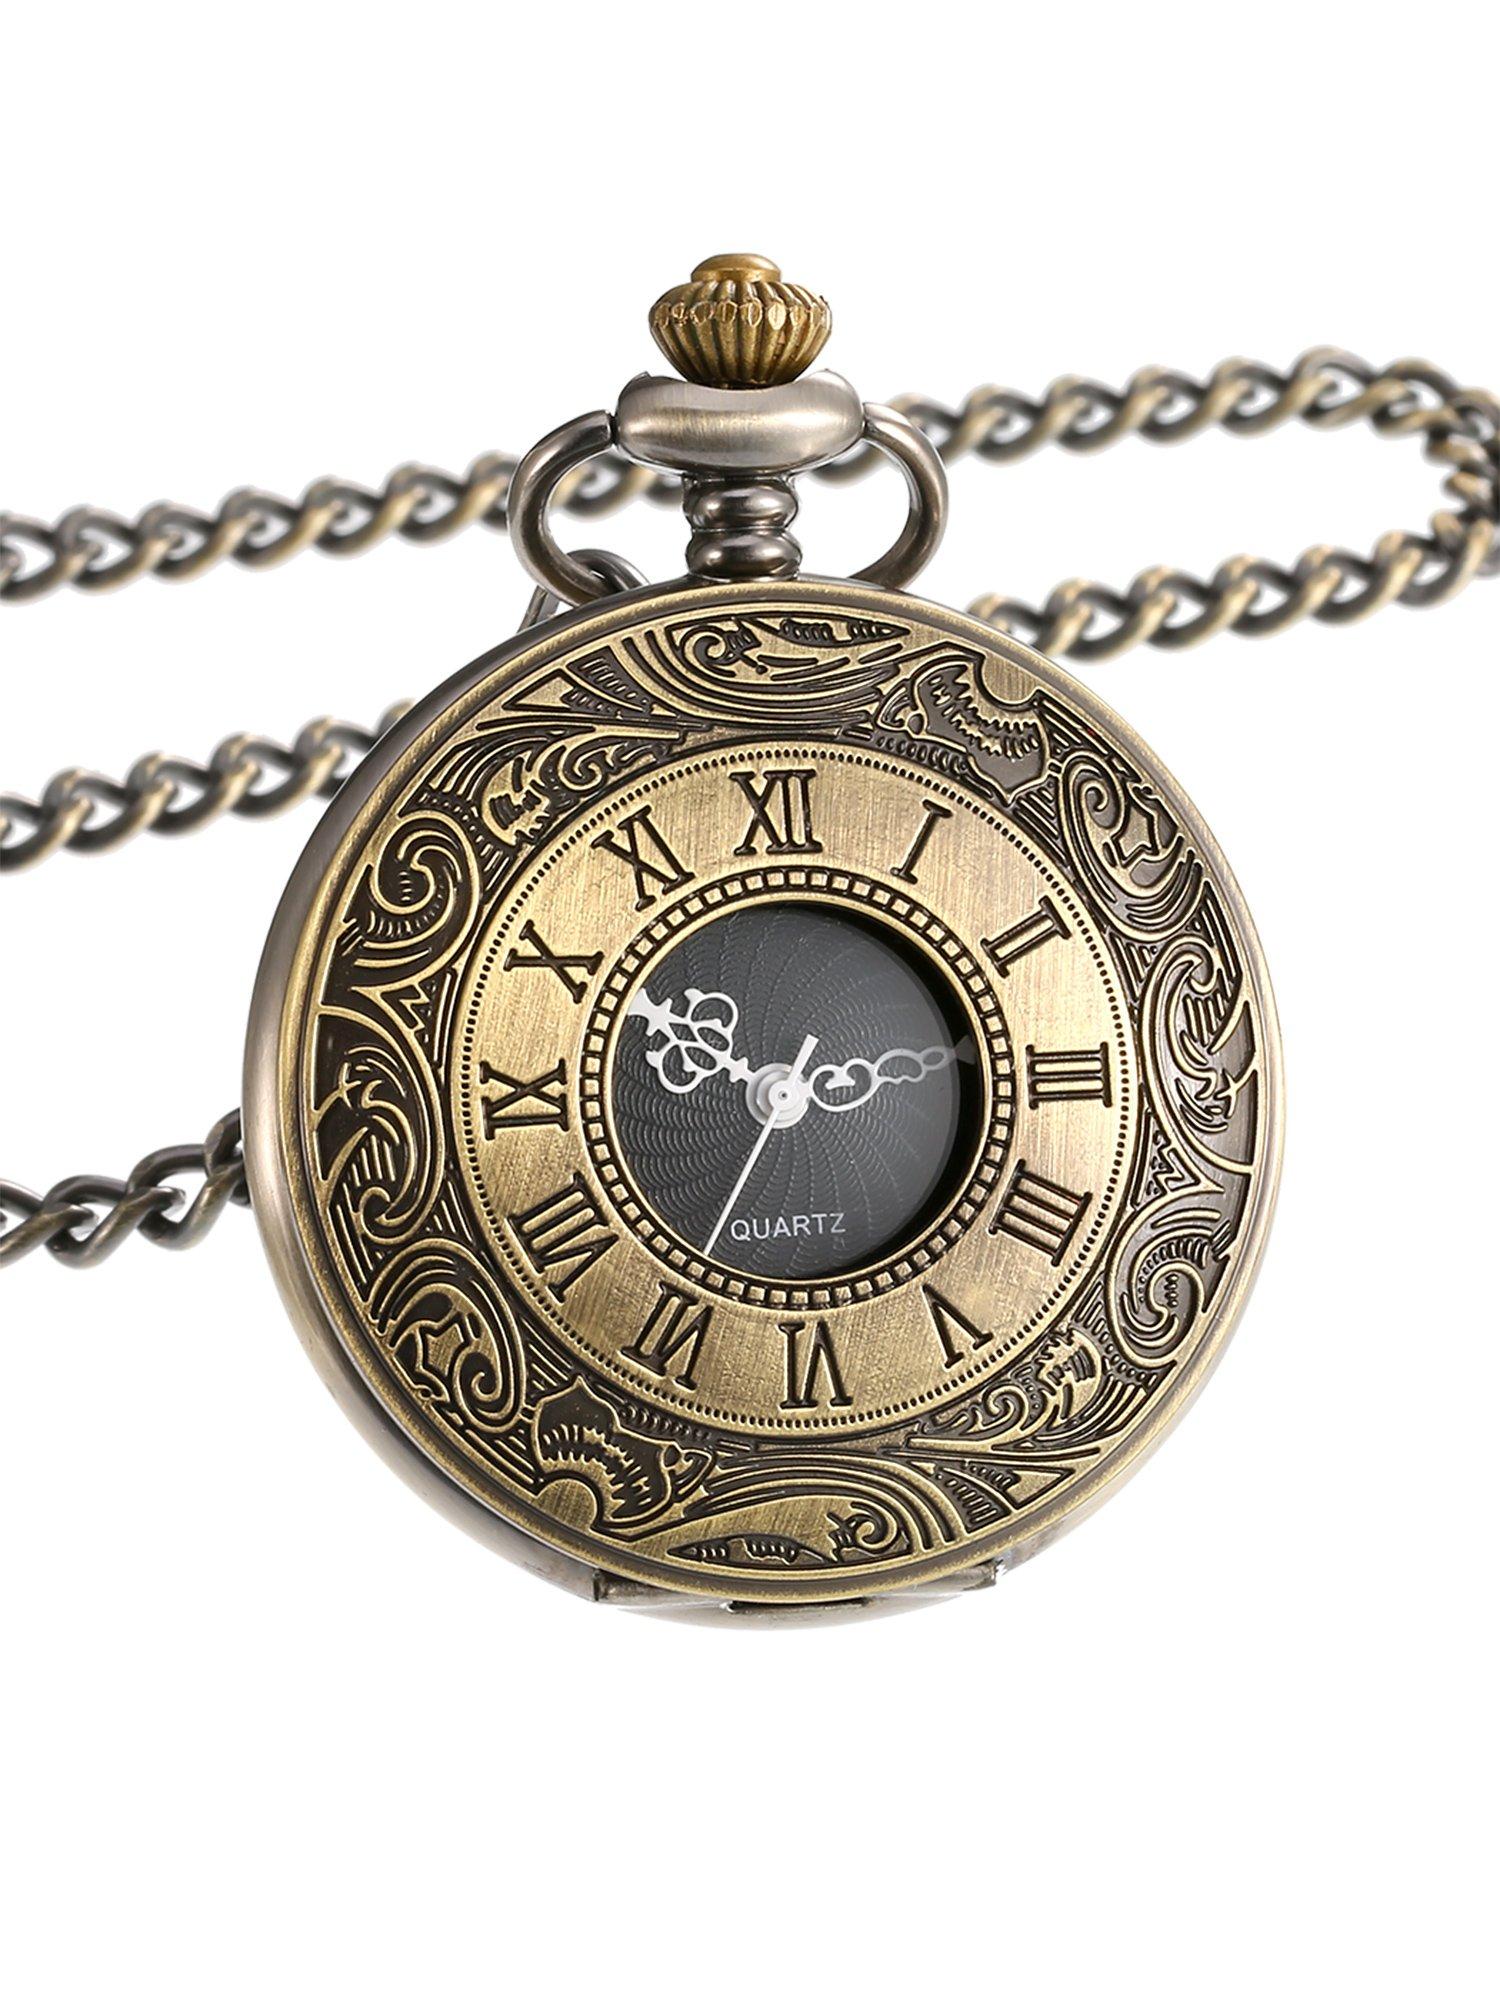 Mudder Vintage Roman Numerals Scale Quartz Pocket Watch with Chain (Bronze) Mudder Vintage Roman Numerals Scale Quartz Pocket Watch with Chain (Bronze)